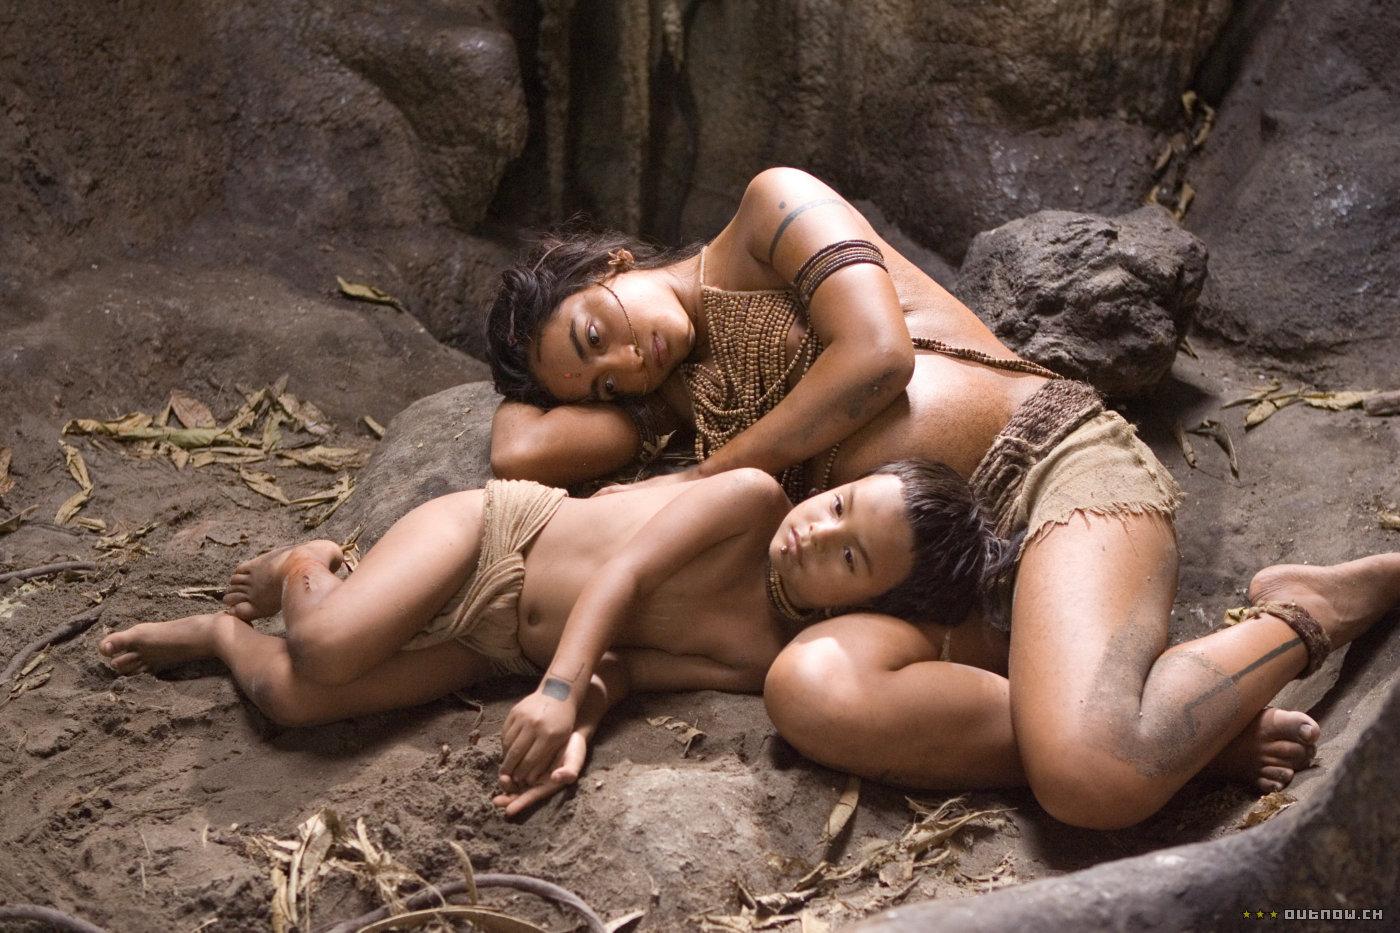 Captured jungle women nudes gallery